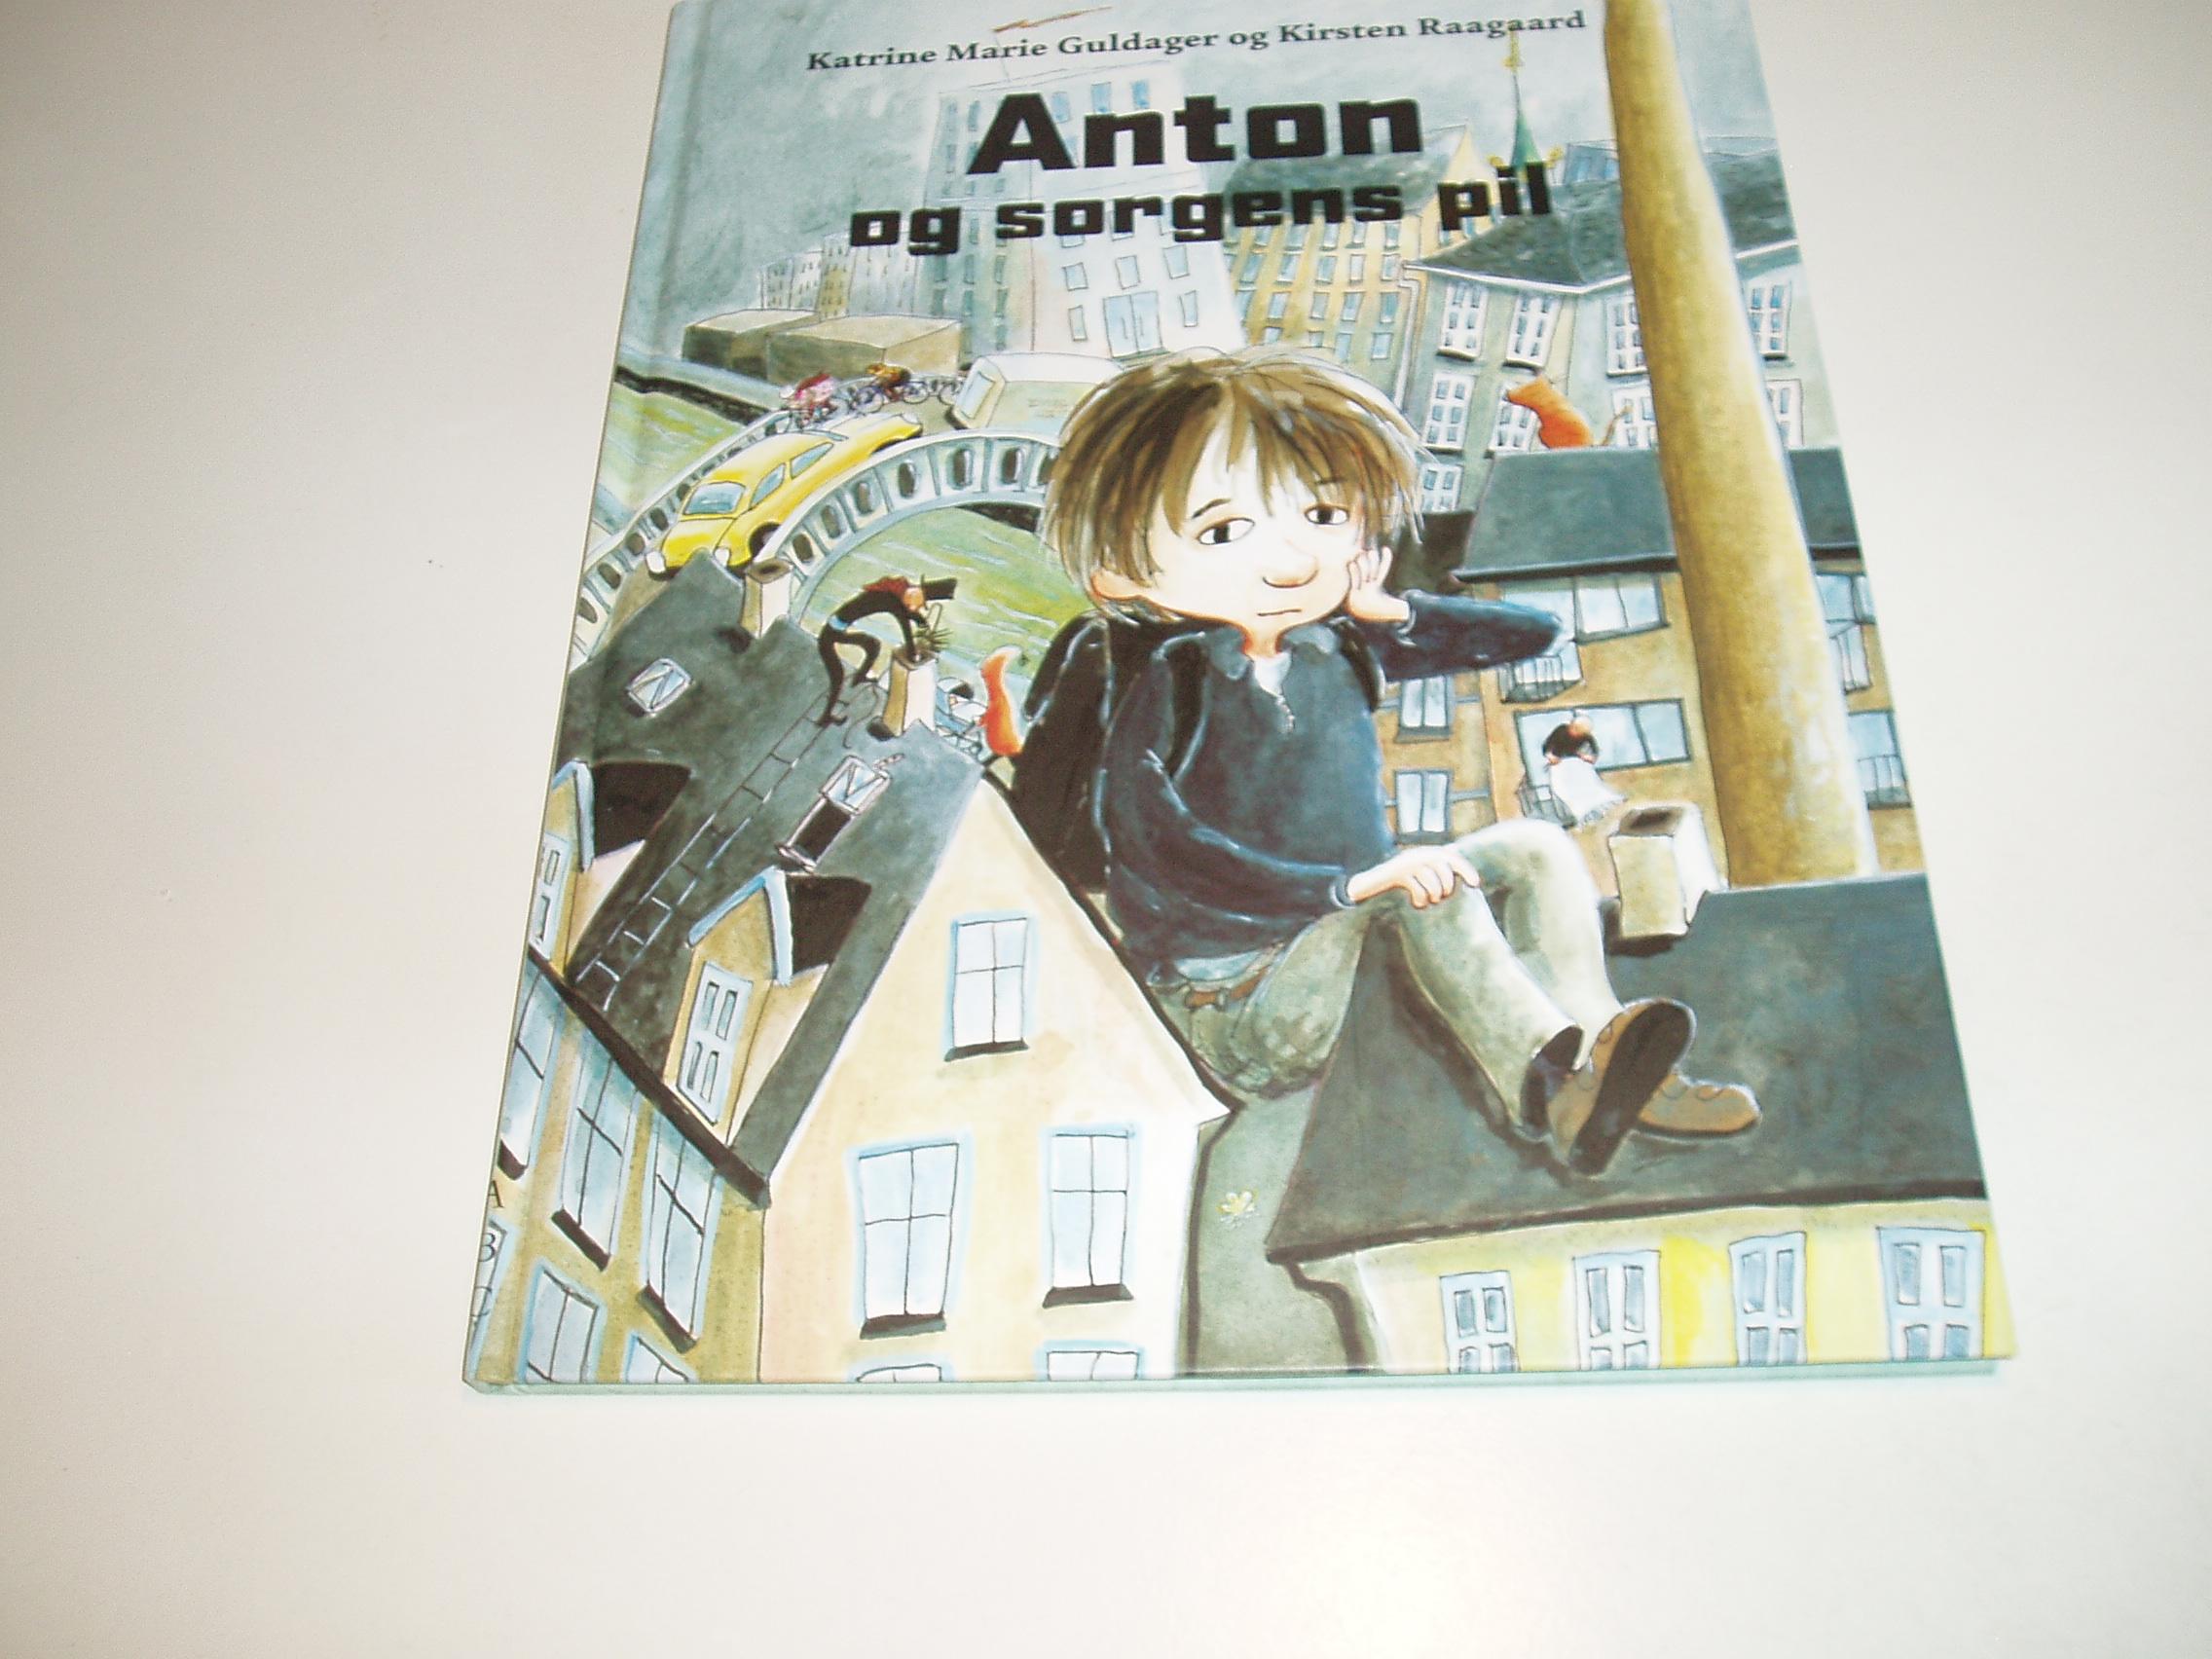 Anton og sorgens pil